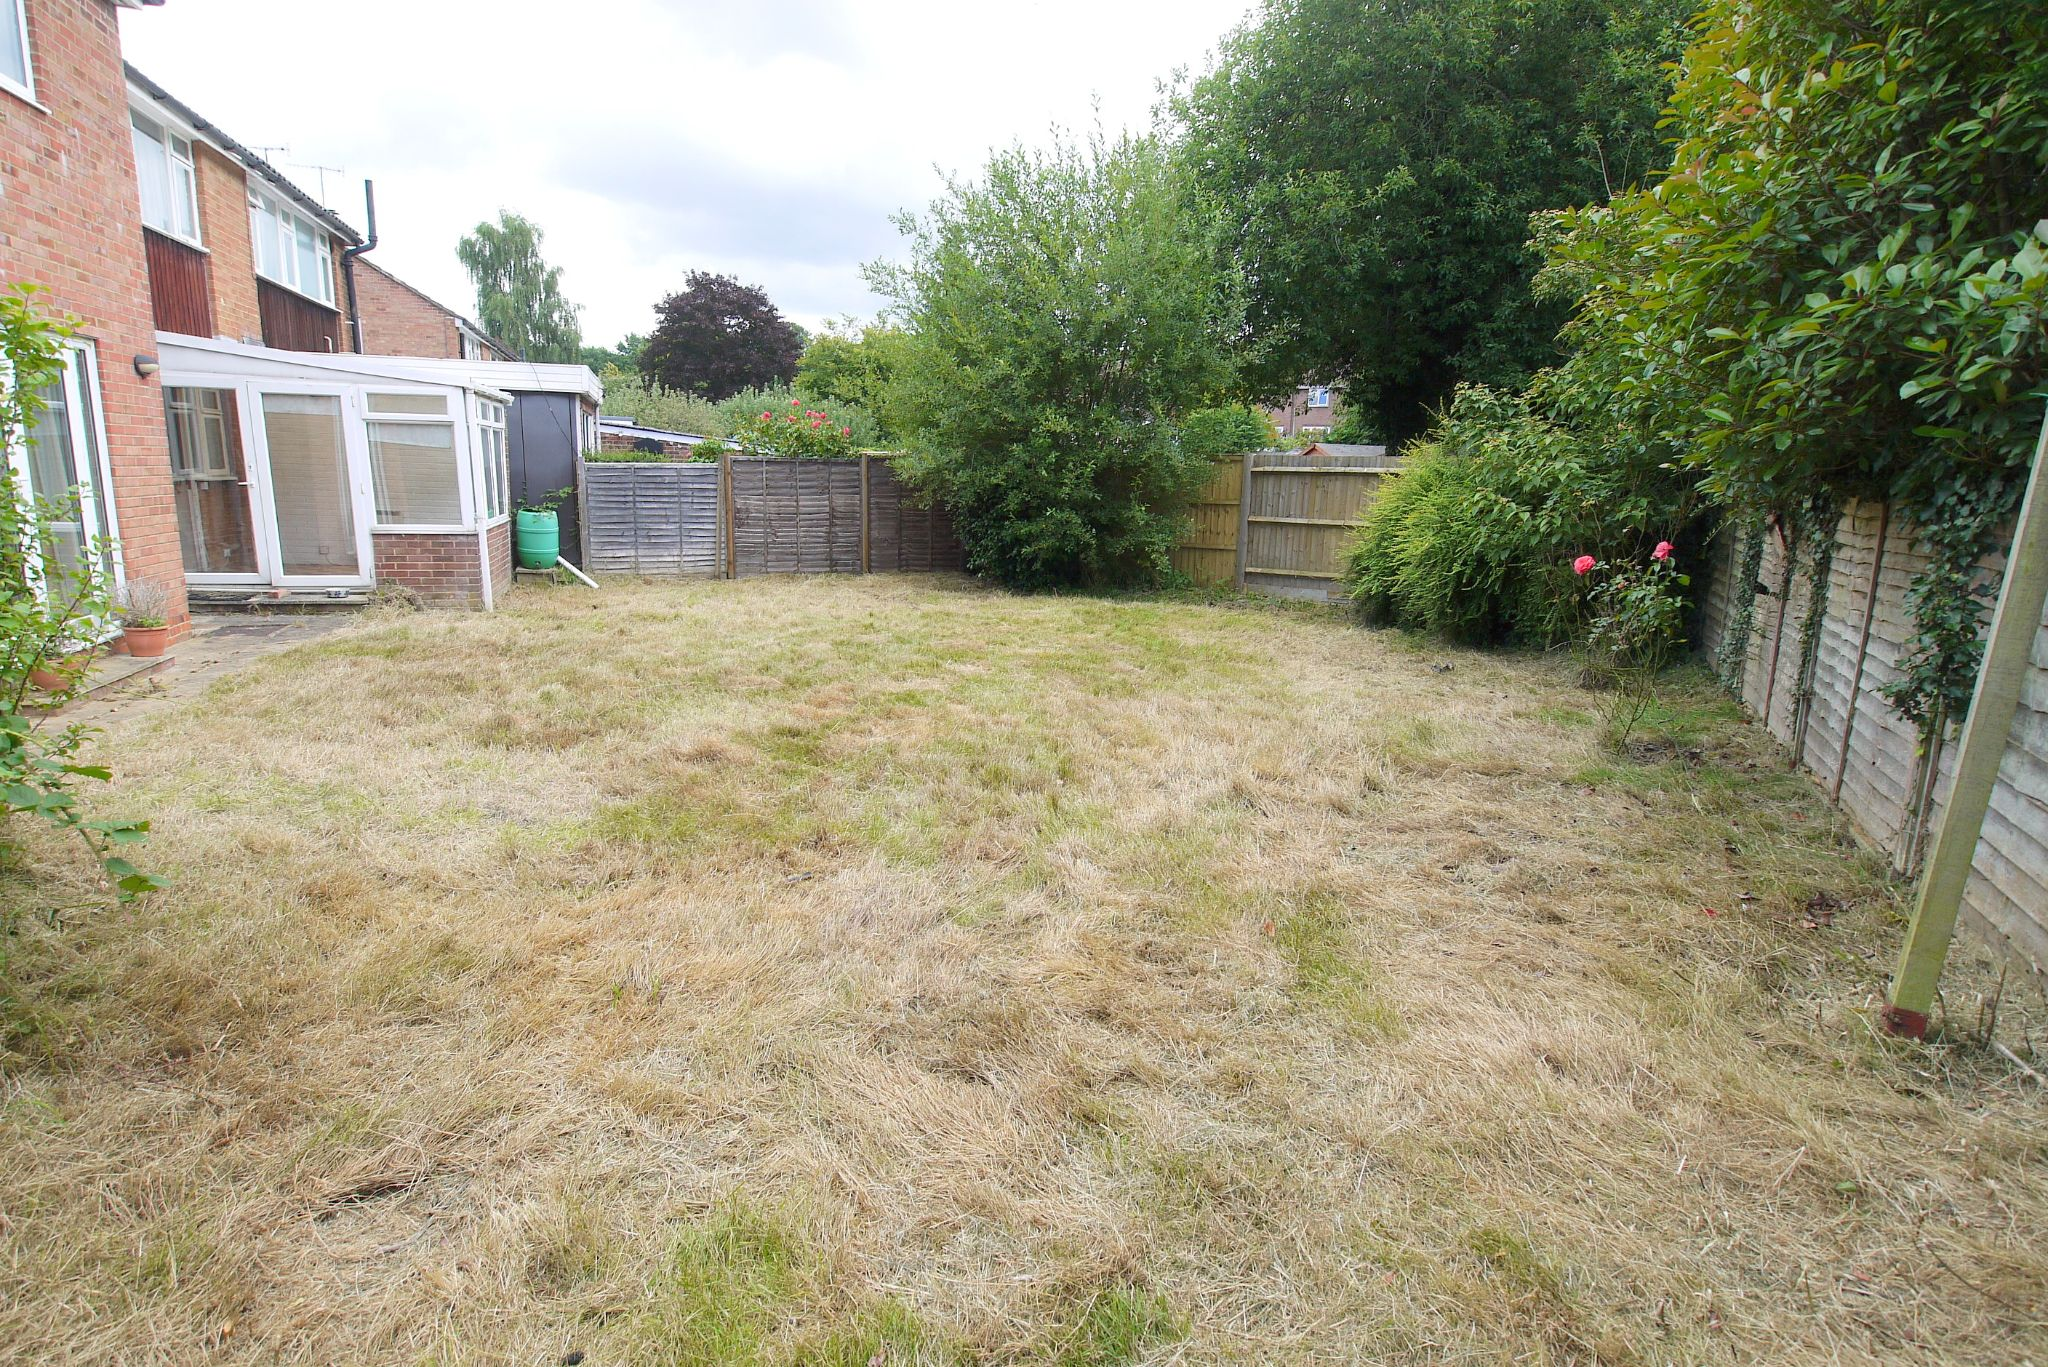 5 bedroom semi-detached house Sold in Sevenoaks - Photograph 11